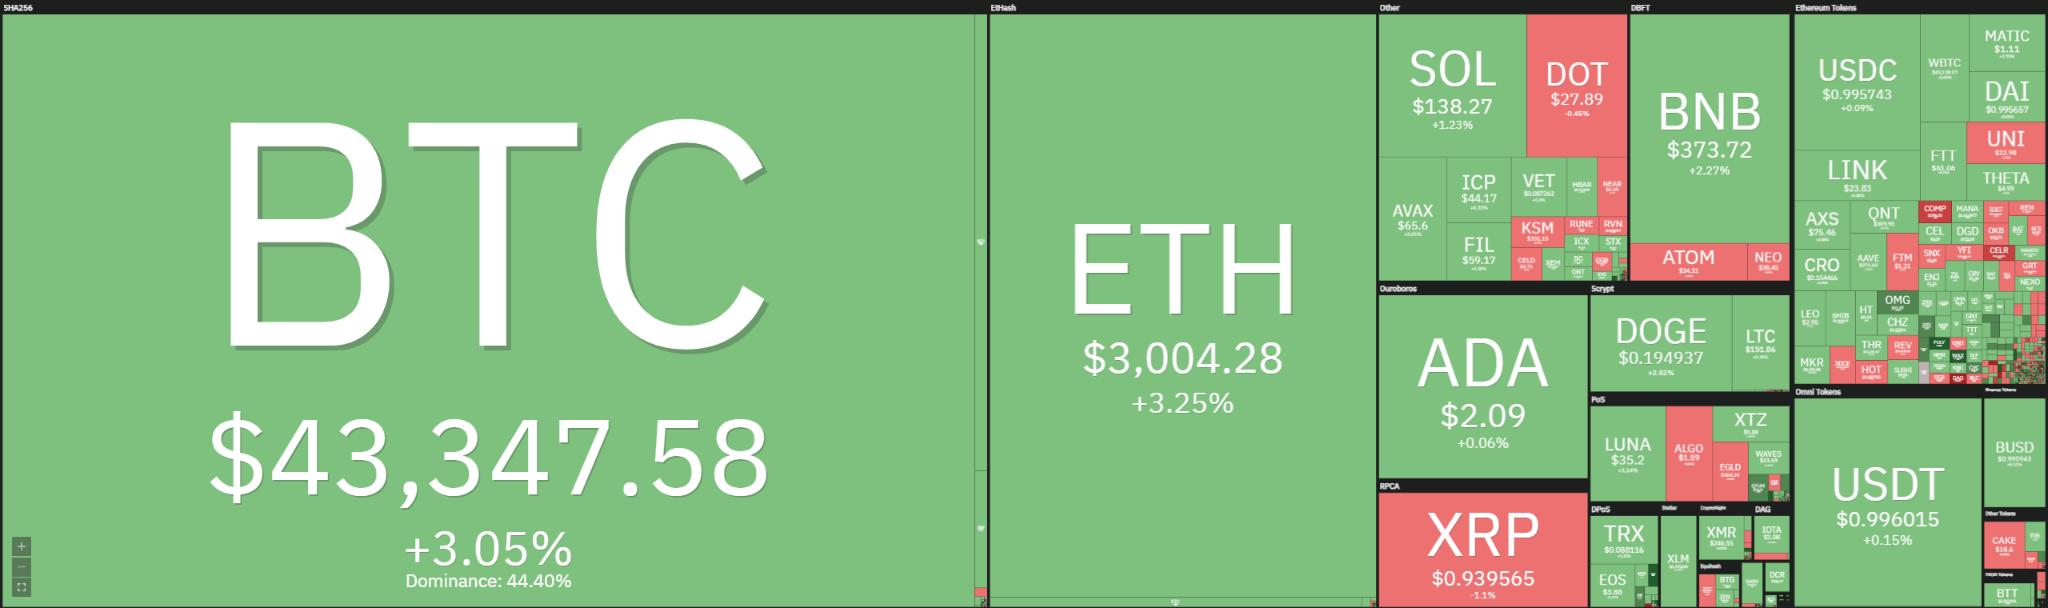 Bitcoin Price Analysis: BTC swiftly retests $44,000 again, lower high set? 1